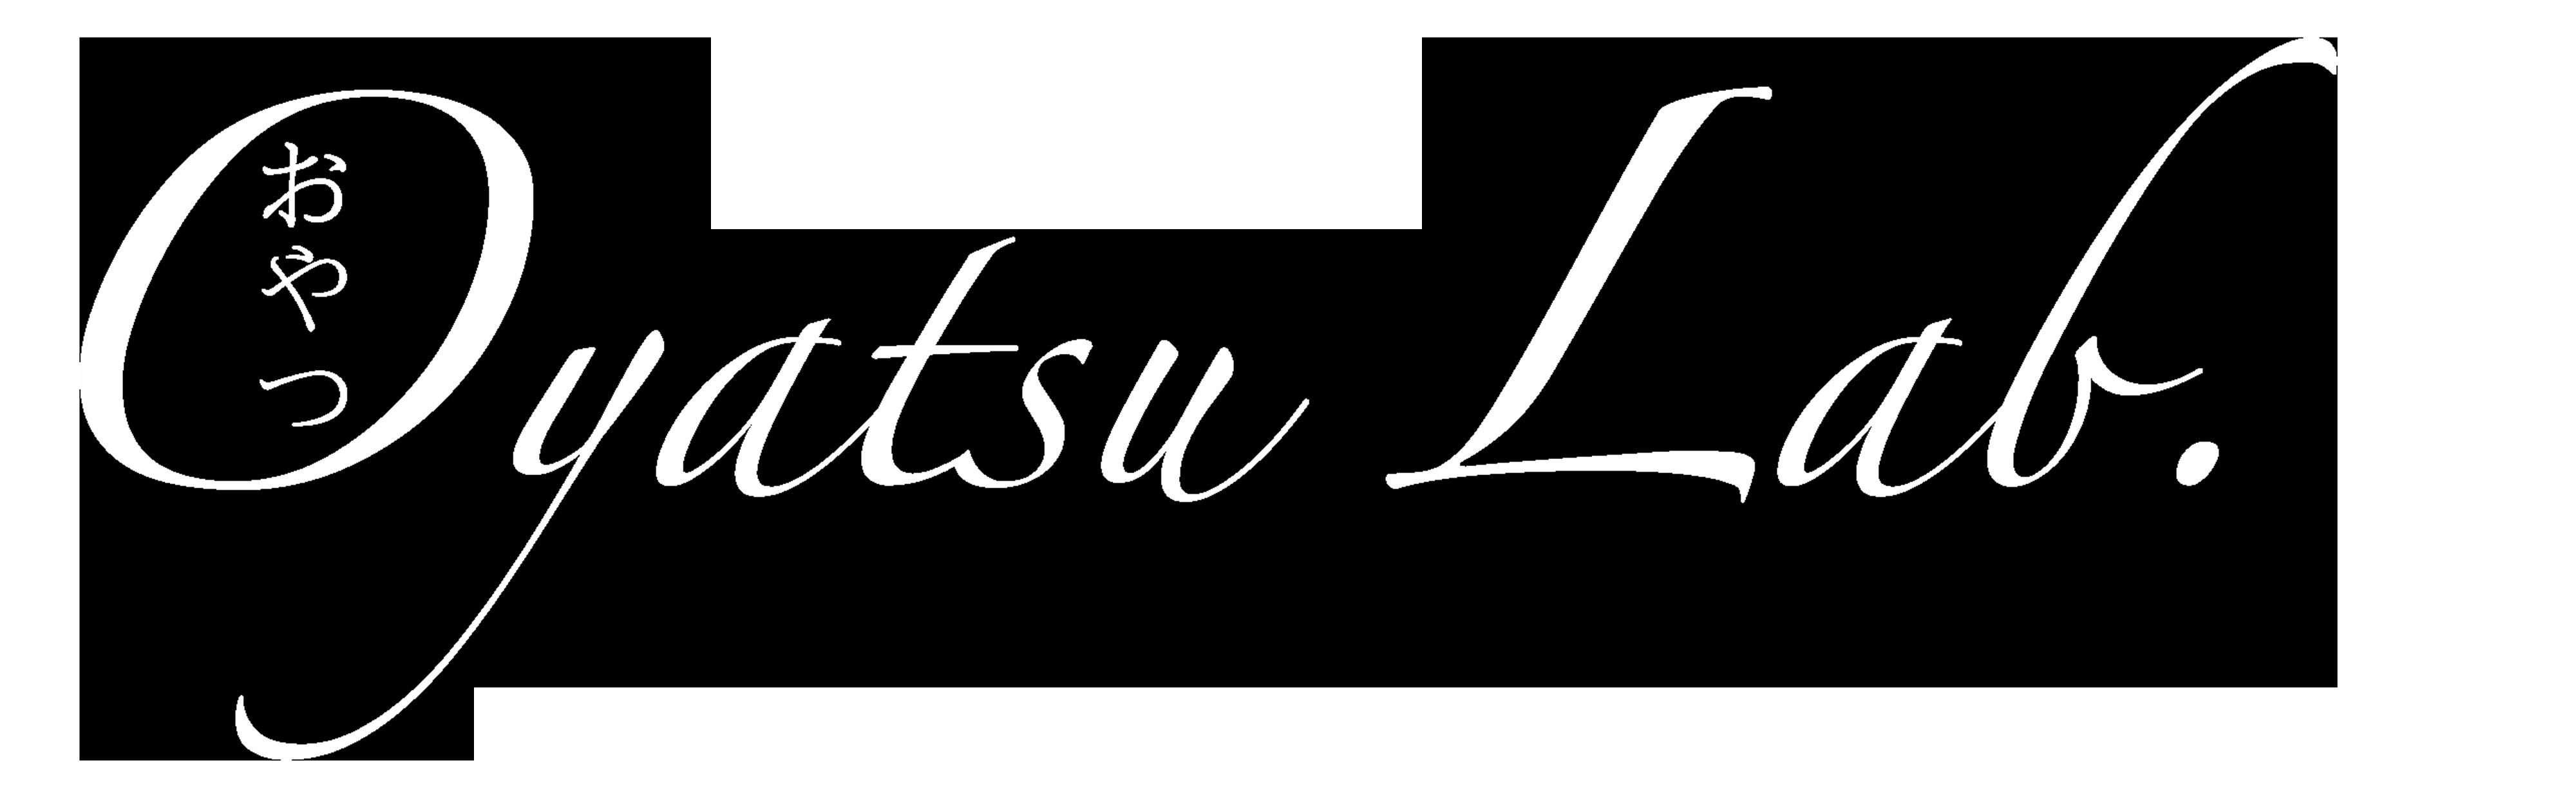 Oyatsu Lab. [おやつラボ]公式サイト